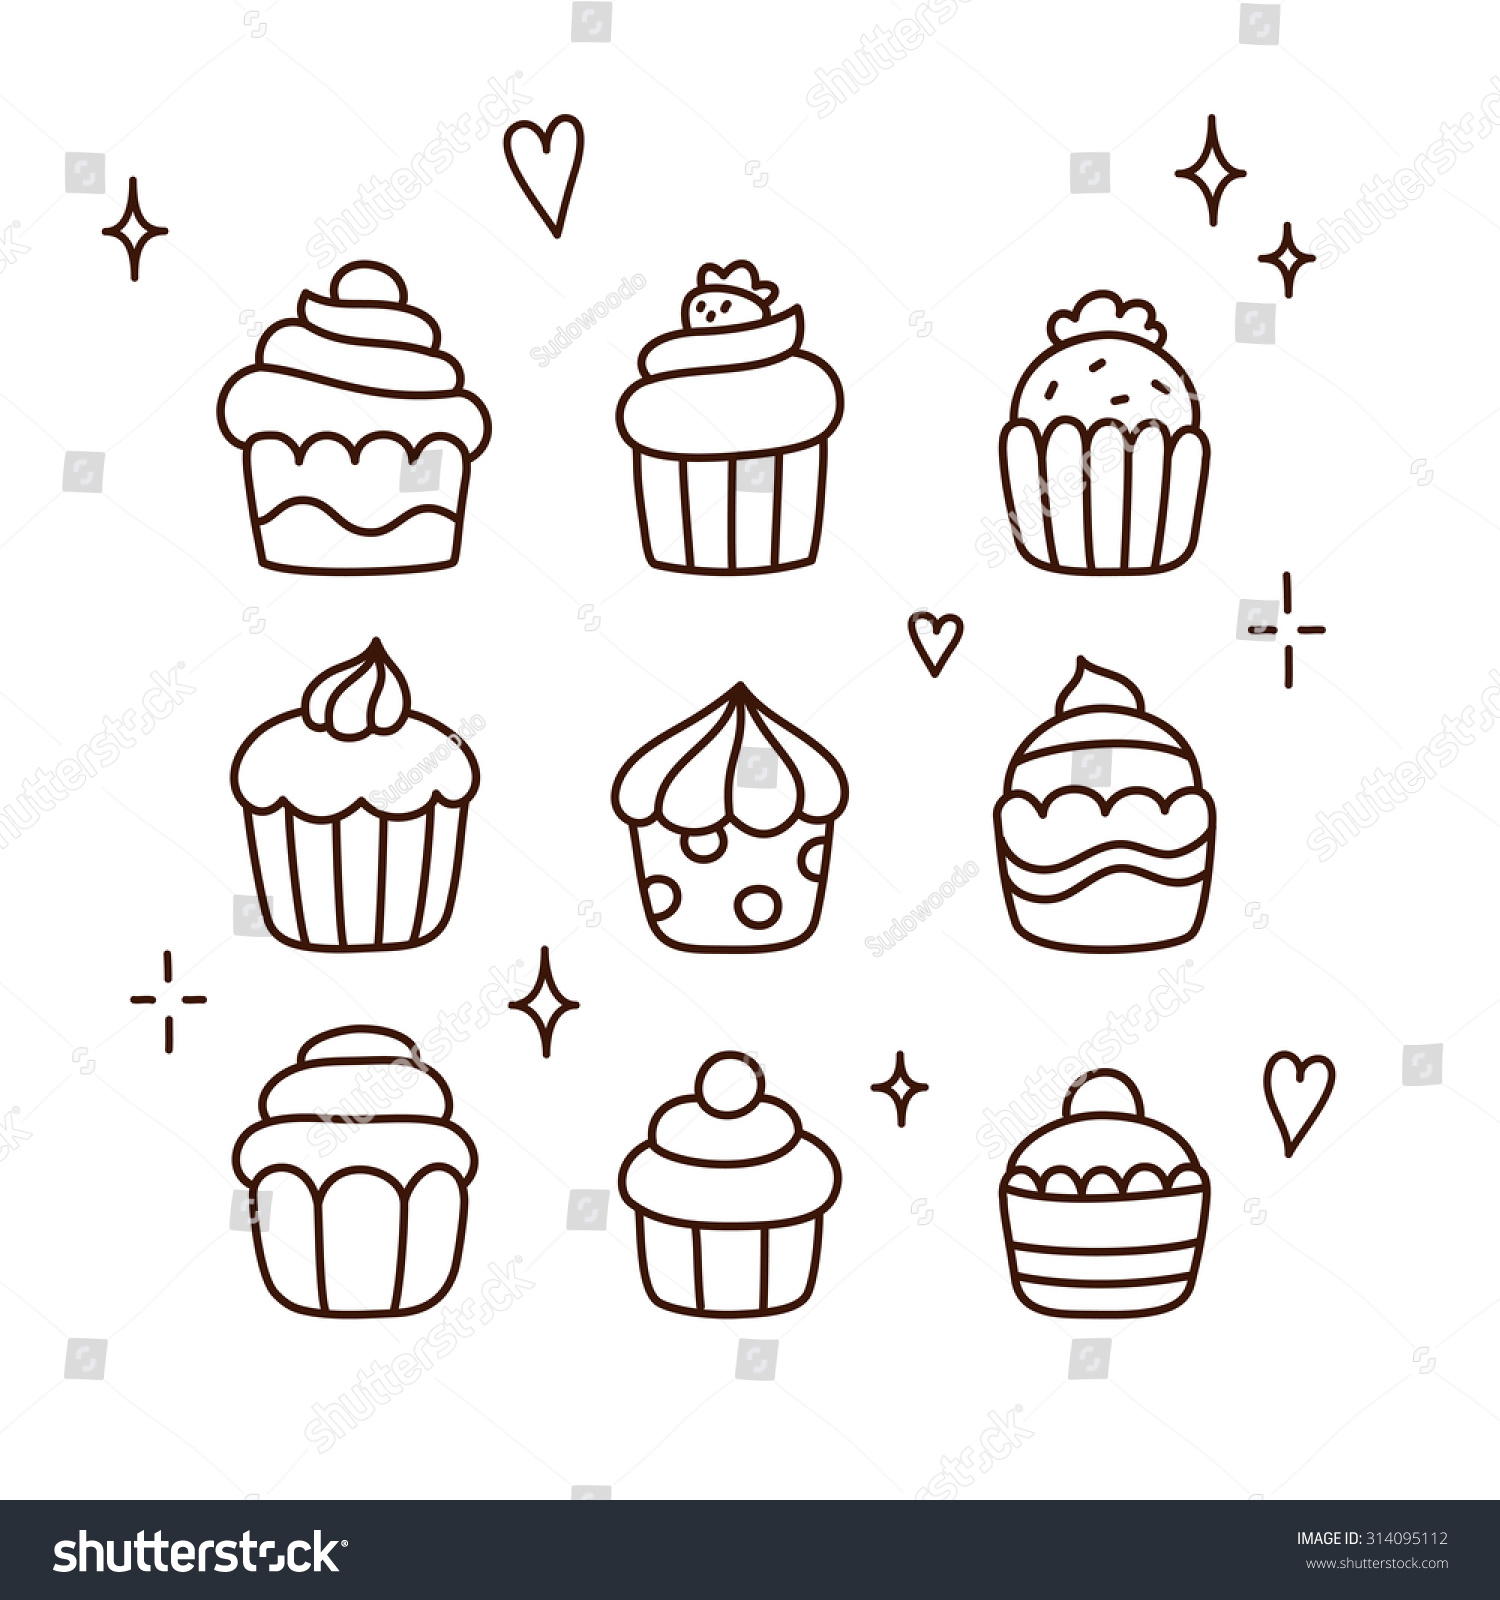 Simple Birthday Cake Drawing